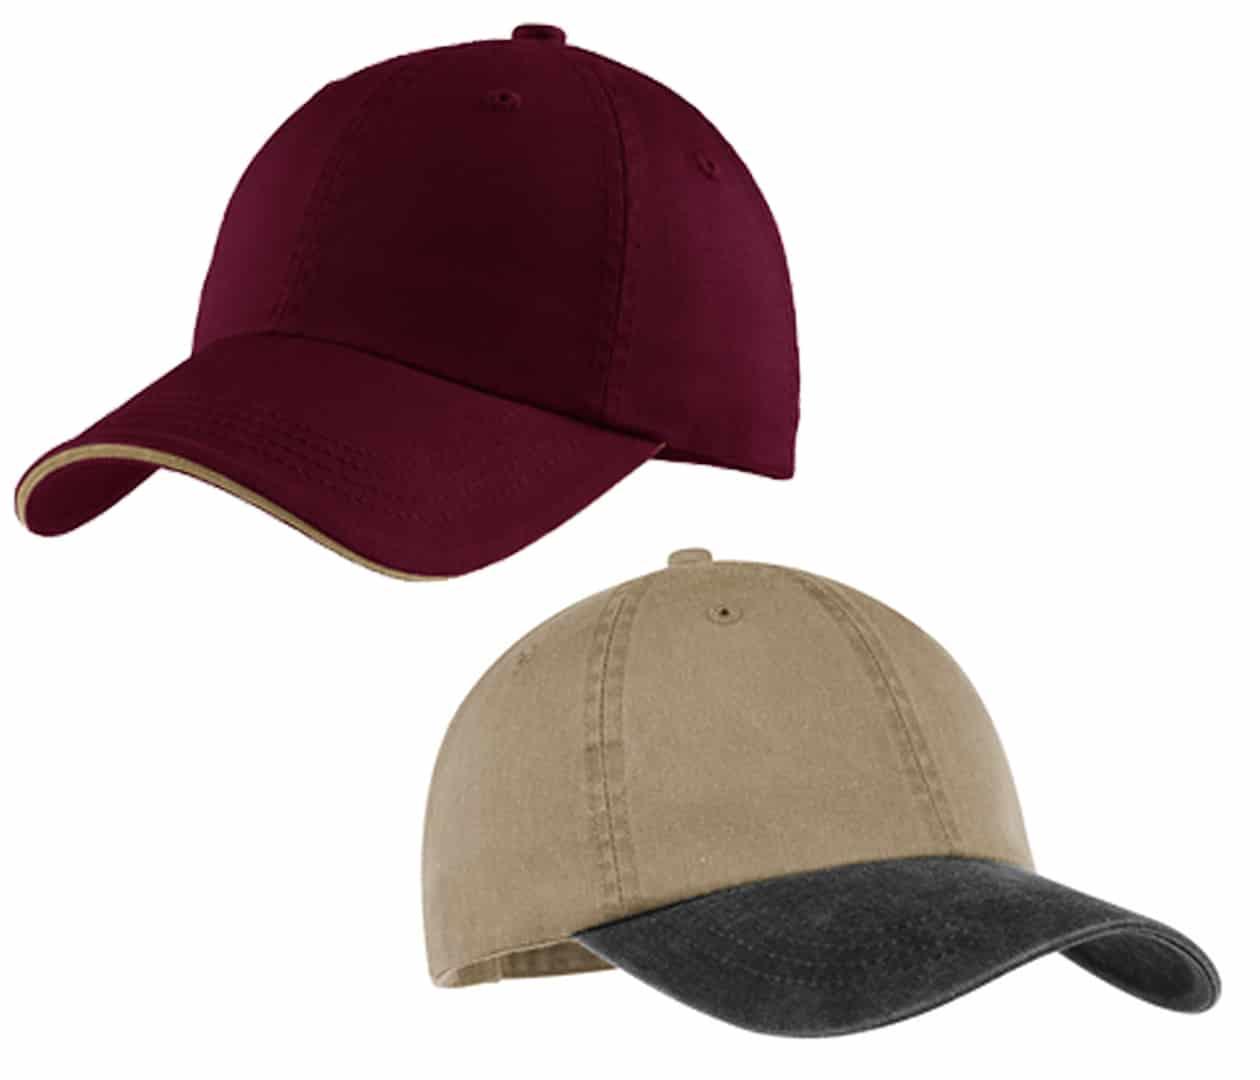 Photo of Twill Caps